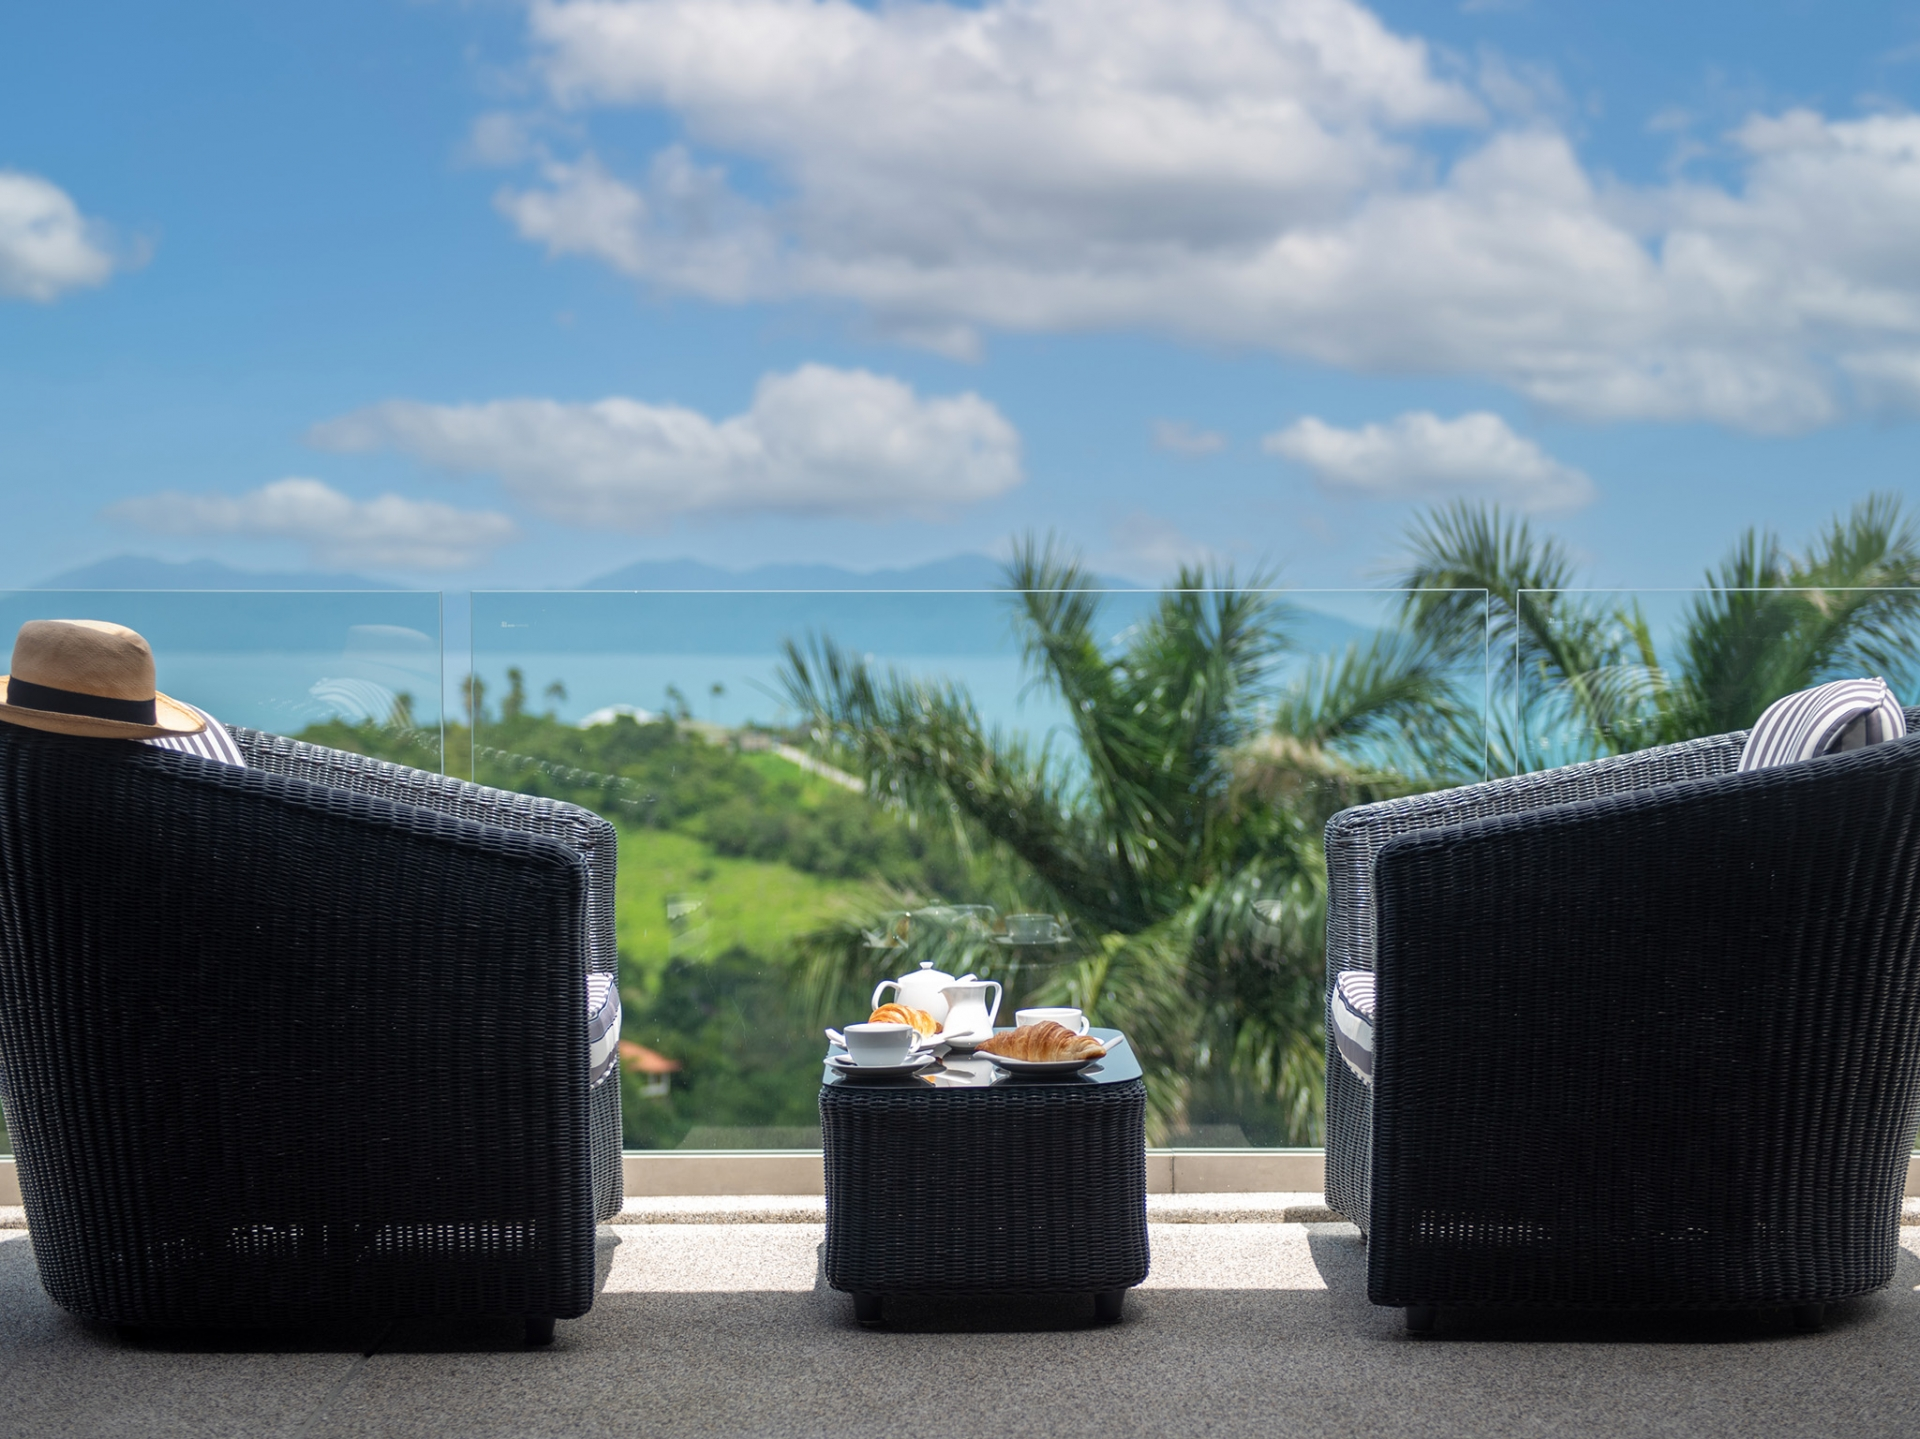 Breathtaking Family Villa-013 Villa Suralai - Breakfast with an amazing view.jpg